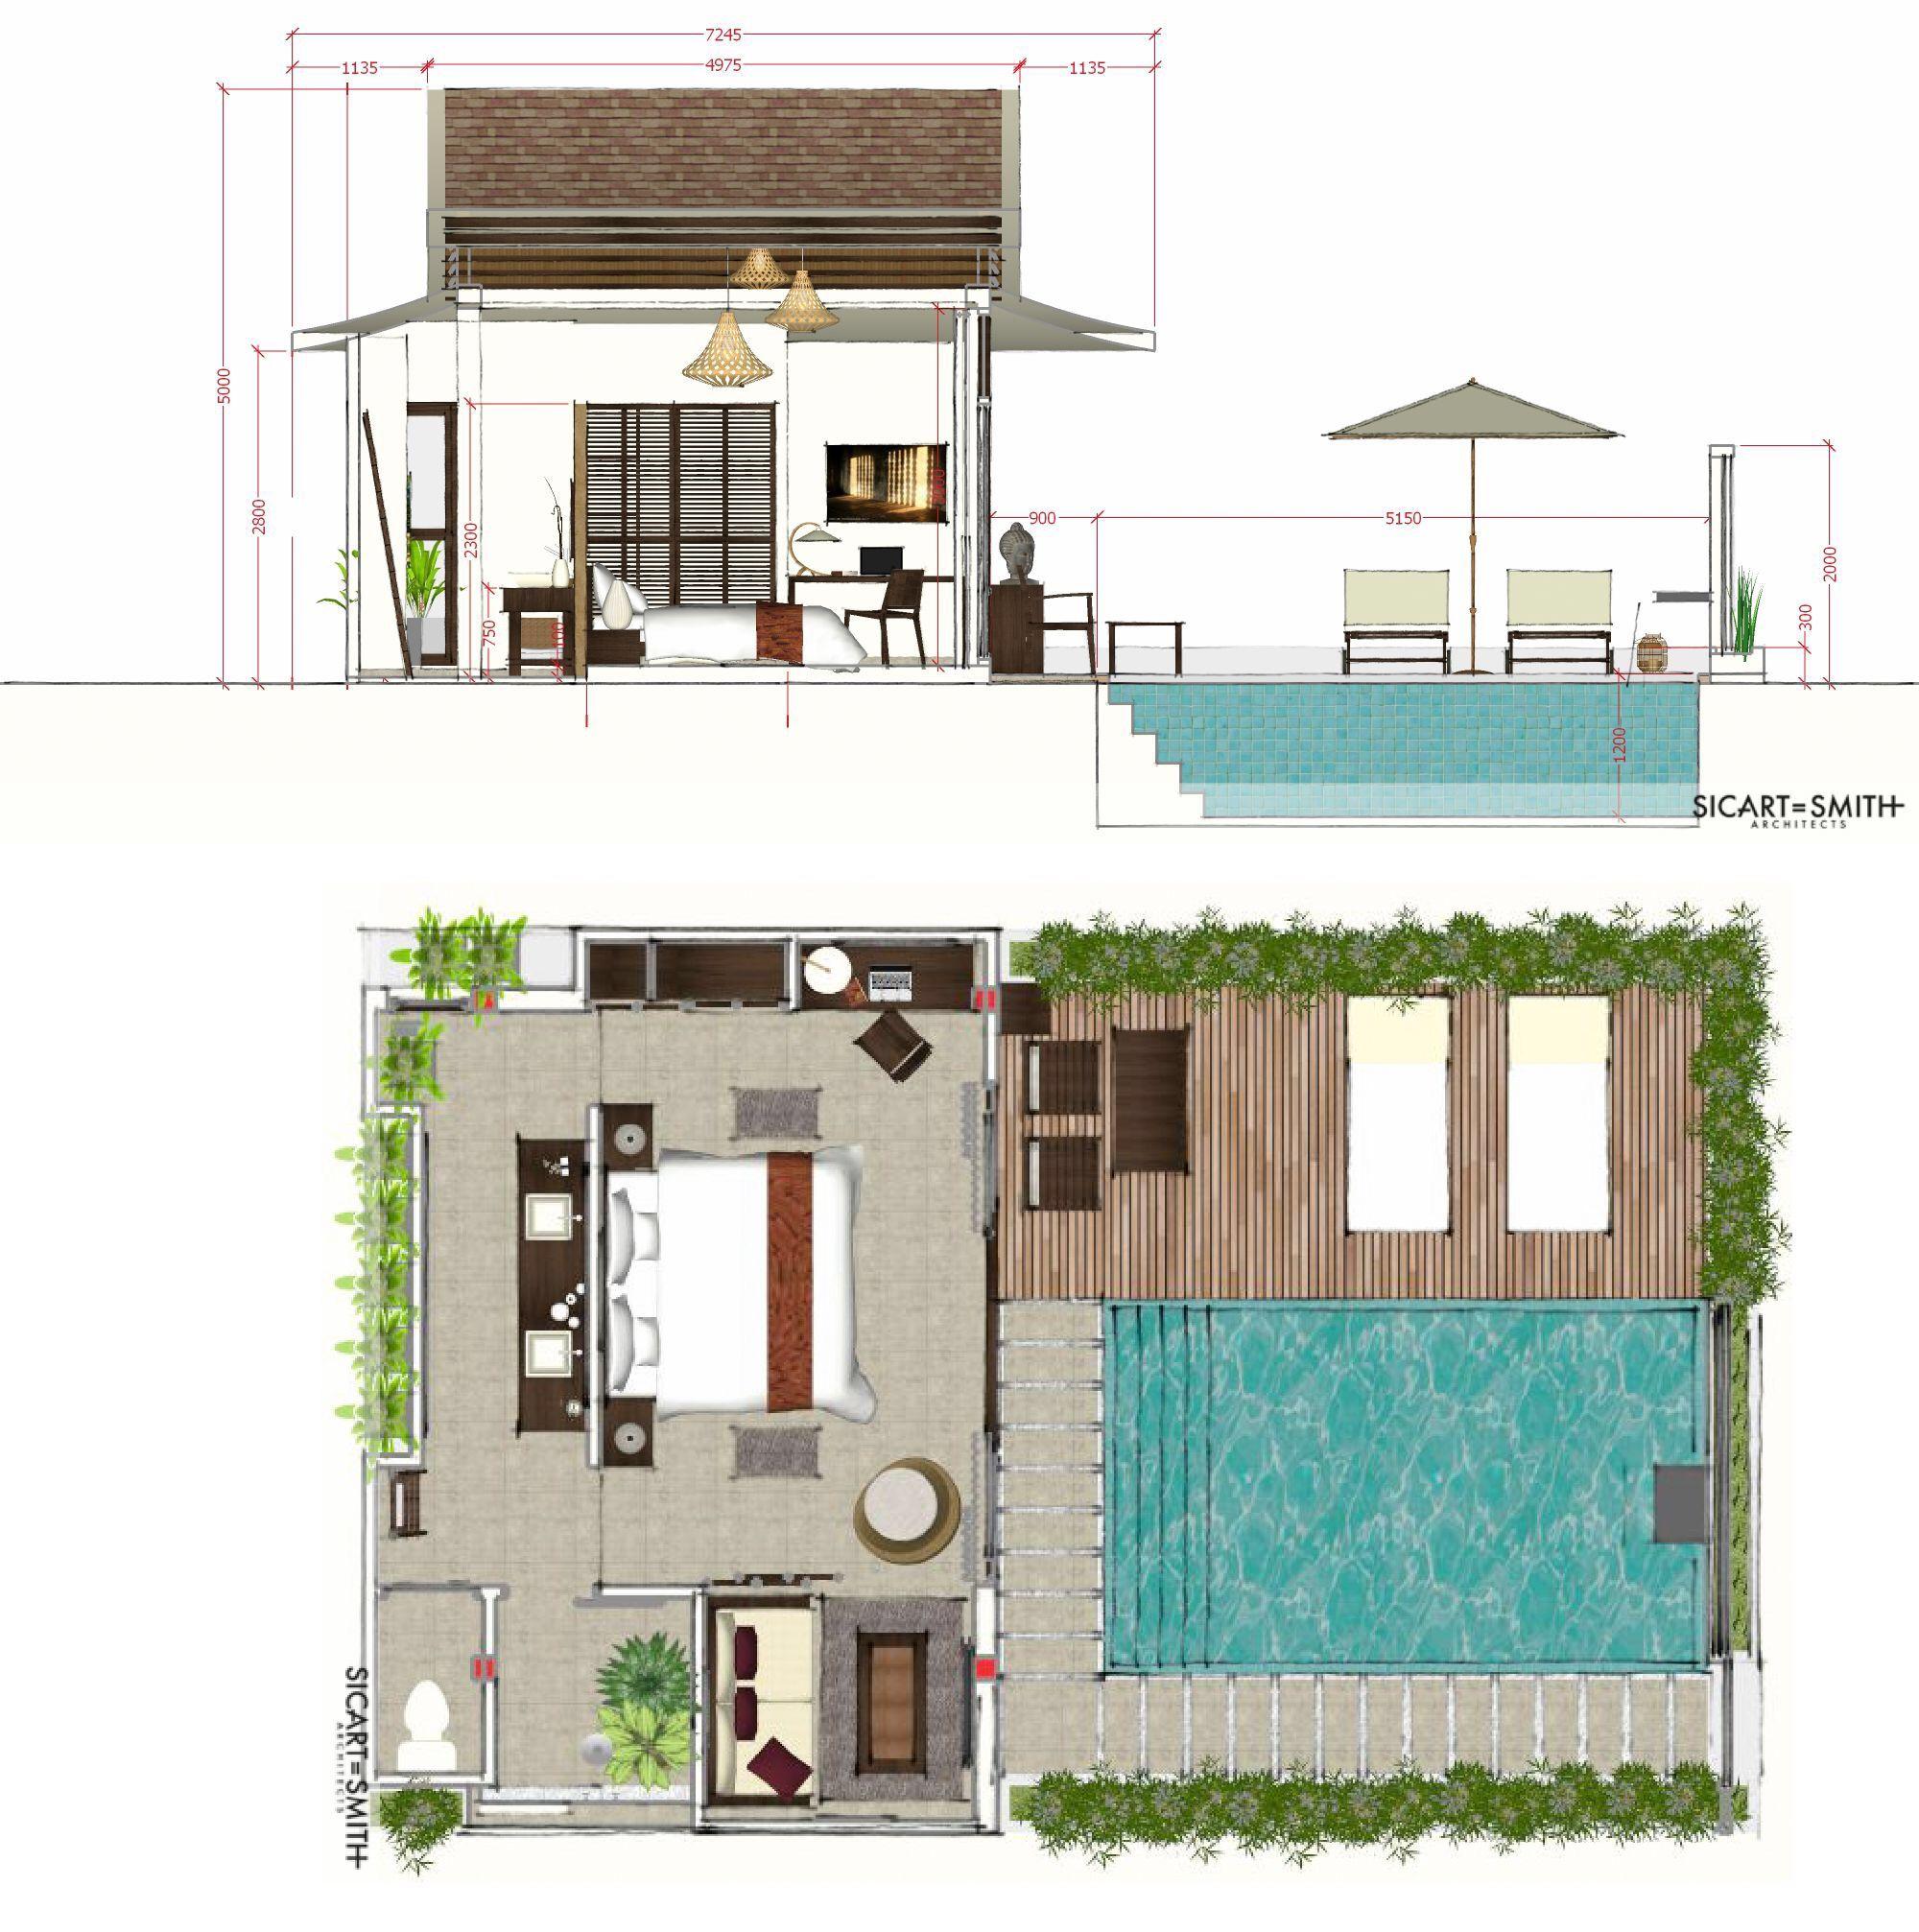 Khwan Samui Beach Resort Sicart Smith Architects Boutique Design Firm Arsitektur Denah Rumah Rumah